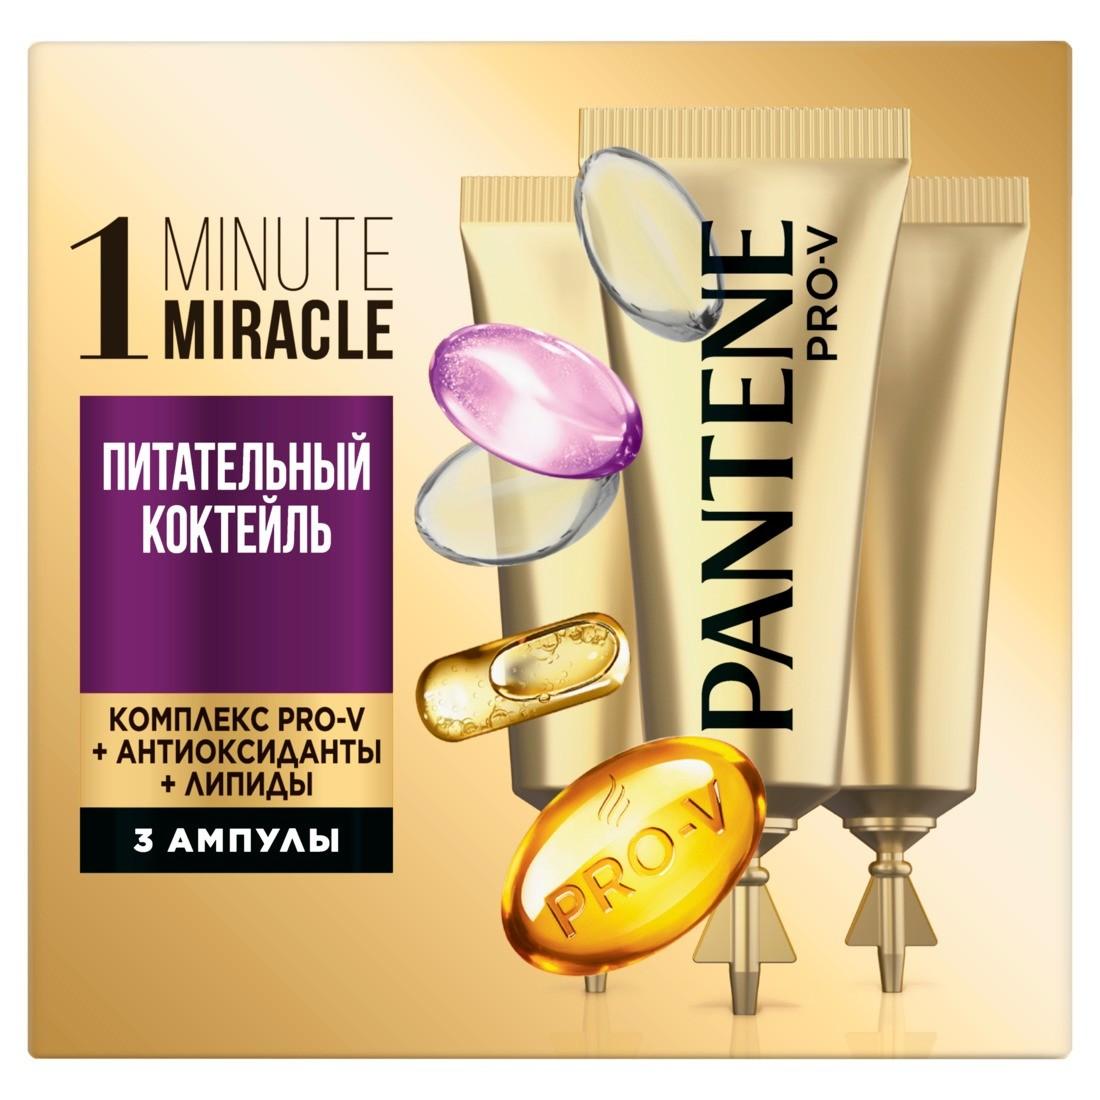 Ампулы 1 Minute Miracle «Питательный Коктейль», Pantene